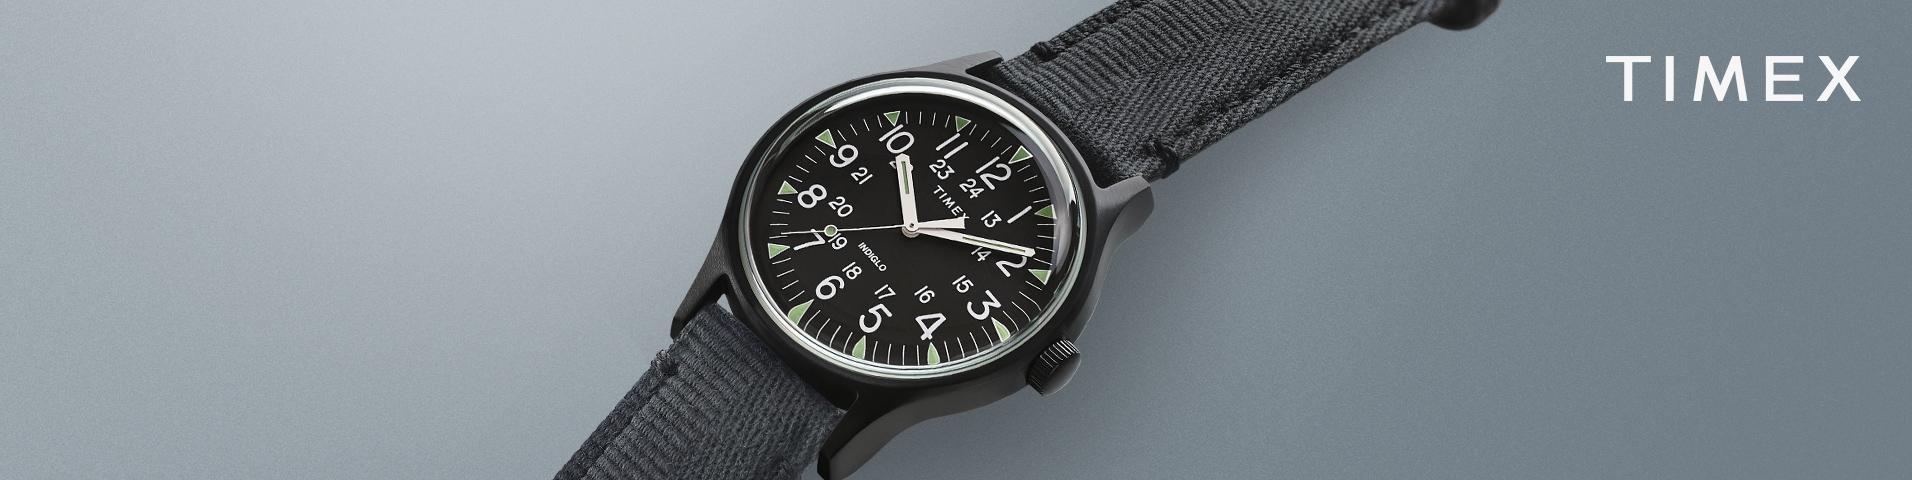 5df8928cb082 Orologi da uomo Timex